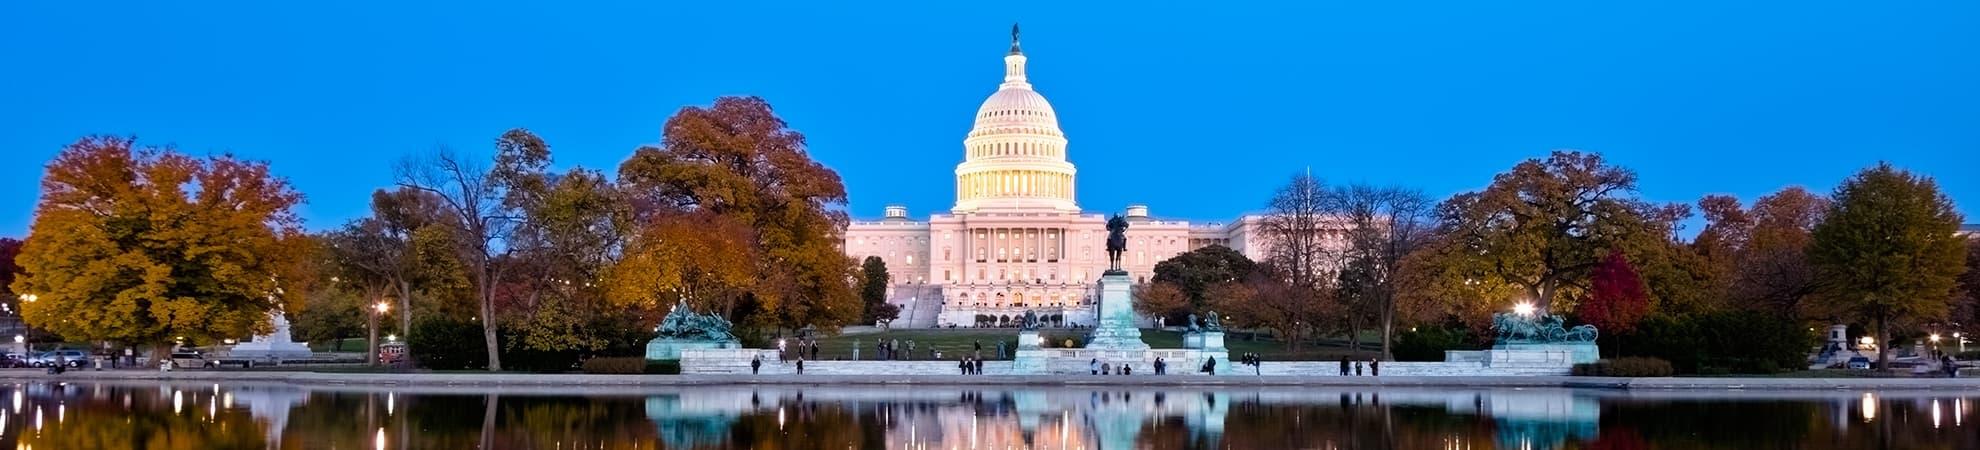 Voyage Washington D.C.